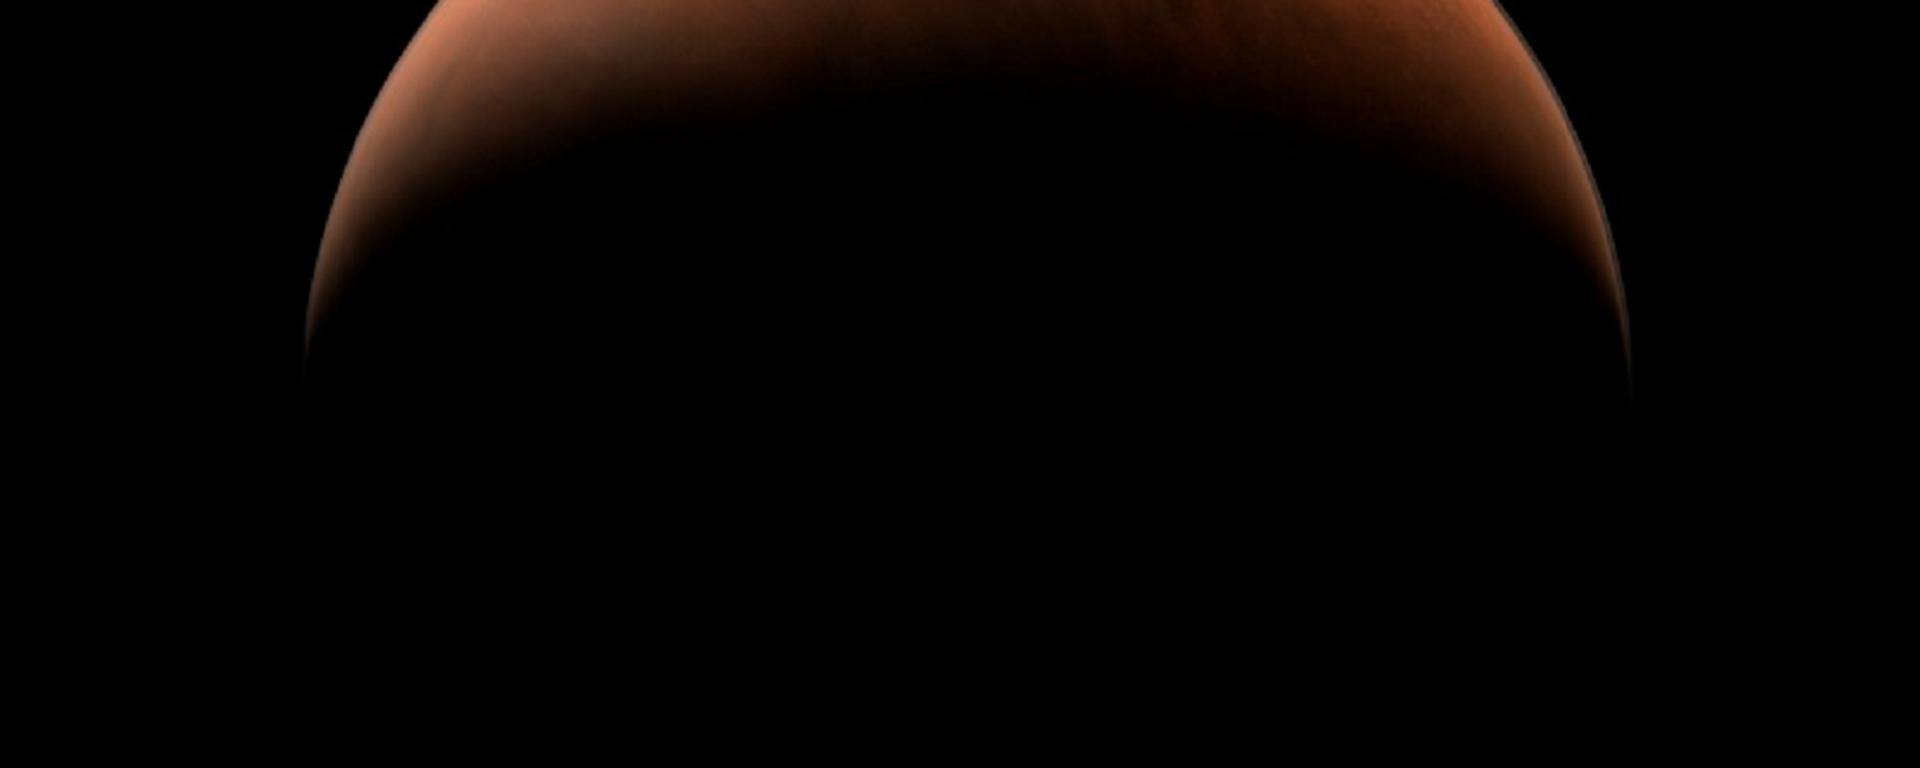 Imagen de Marte tomada por la sonda china Tianwen-1  - Sputnik Mundo, 1920, 26.03.2021